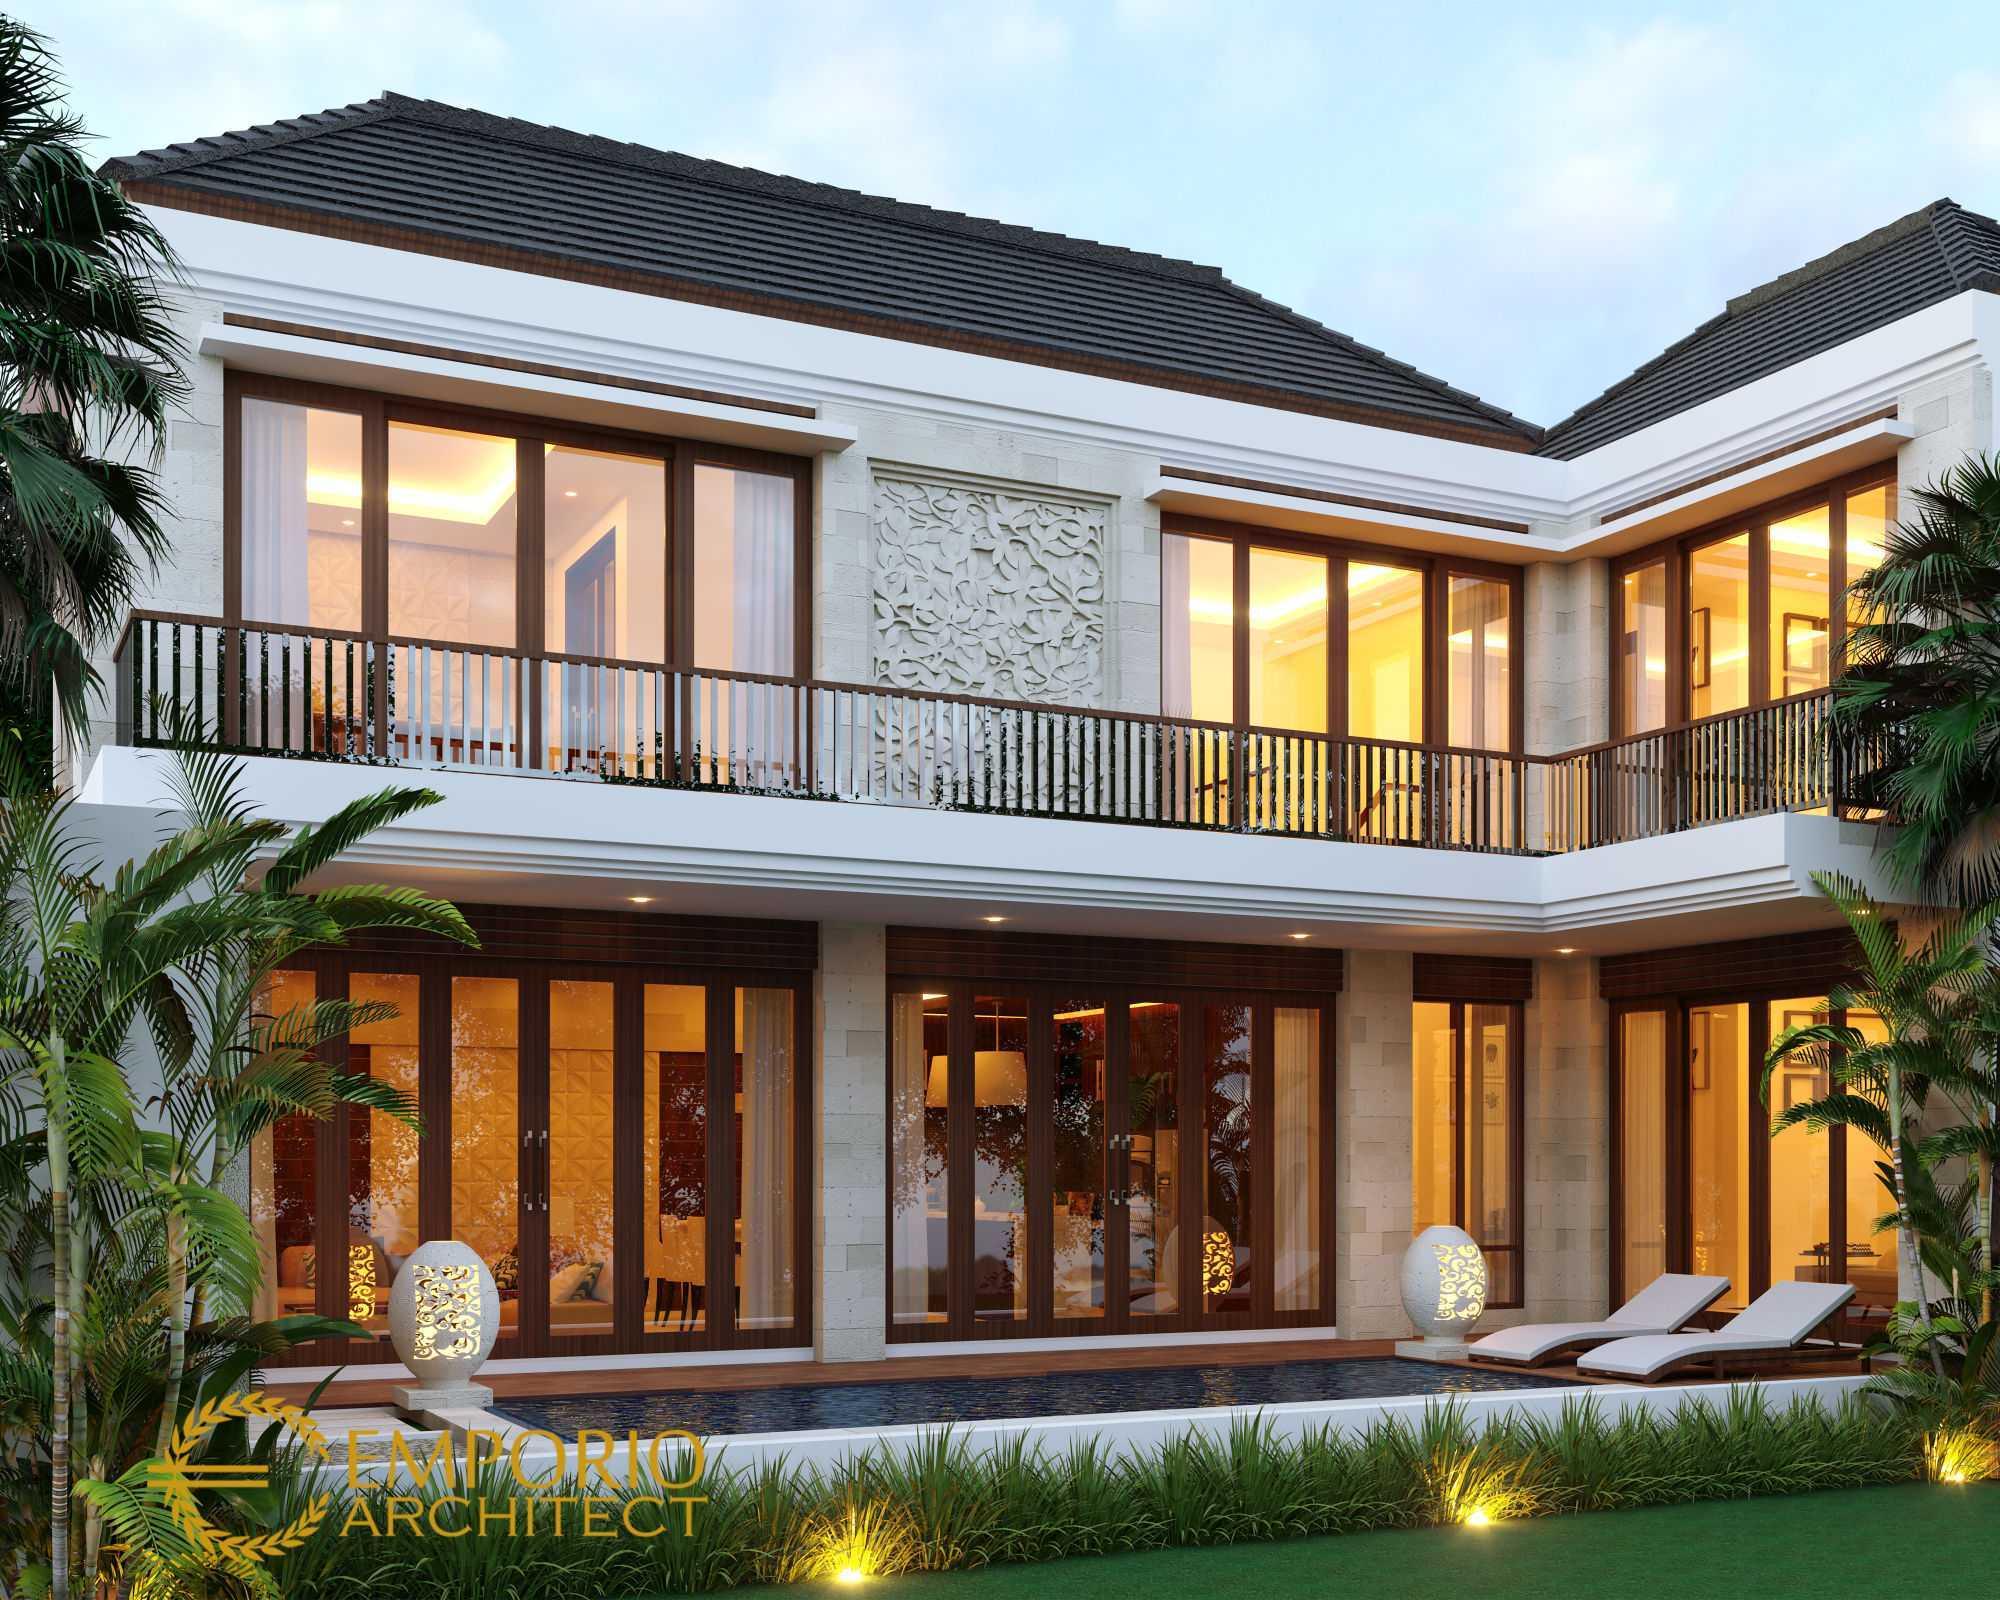 Emporio Architect Jasa Arsitek Bali Desain Villa Bali Tropis 649 @ Mengwi, Badung, Bali Mengwi, Kec. Mengwi, Kabupaten Badung, Bali, Indonesia Mengwi, Kec. Mengwi, Kabupaten Badung, Bali, Indonesia Emporio-Architect-Jasa-Arsitek-Bali-Desain-Villa-Bali-Tropis-649-Mengwi-Badung-Bali  79916